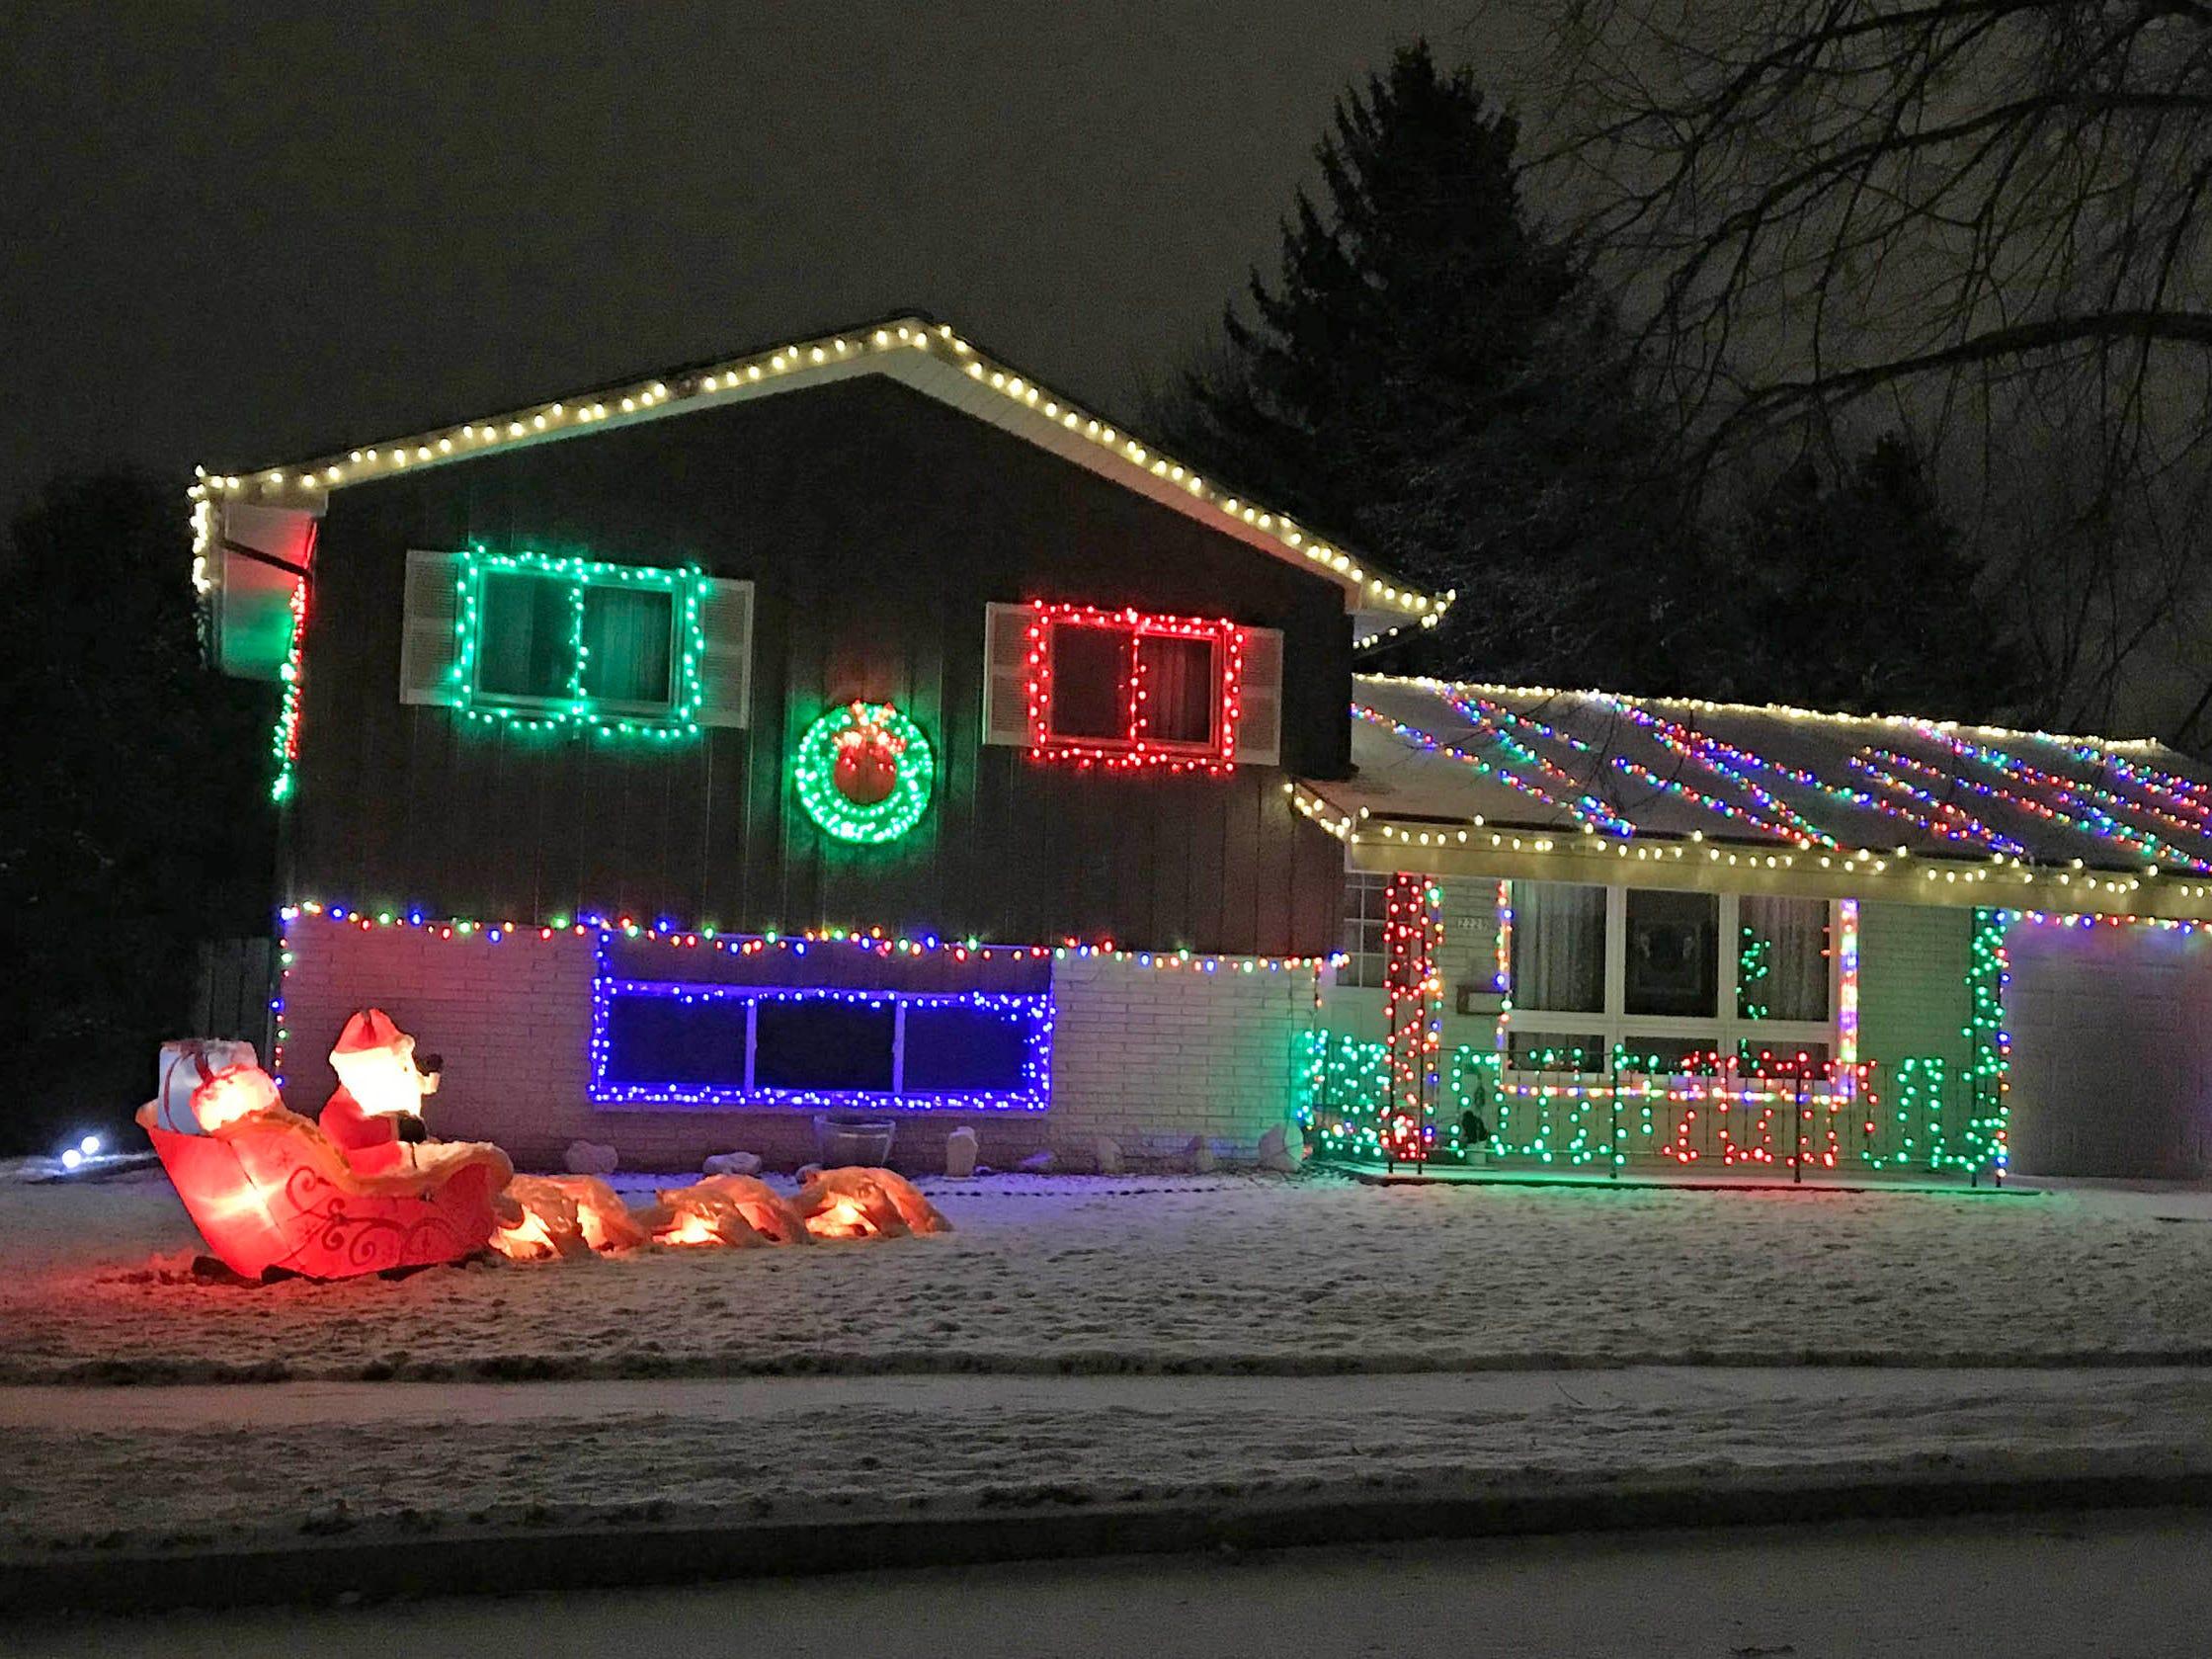 Holiday lights along North 24th Street, Saturday, December 29, 2018, in Sheboygan, Wis.